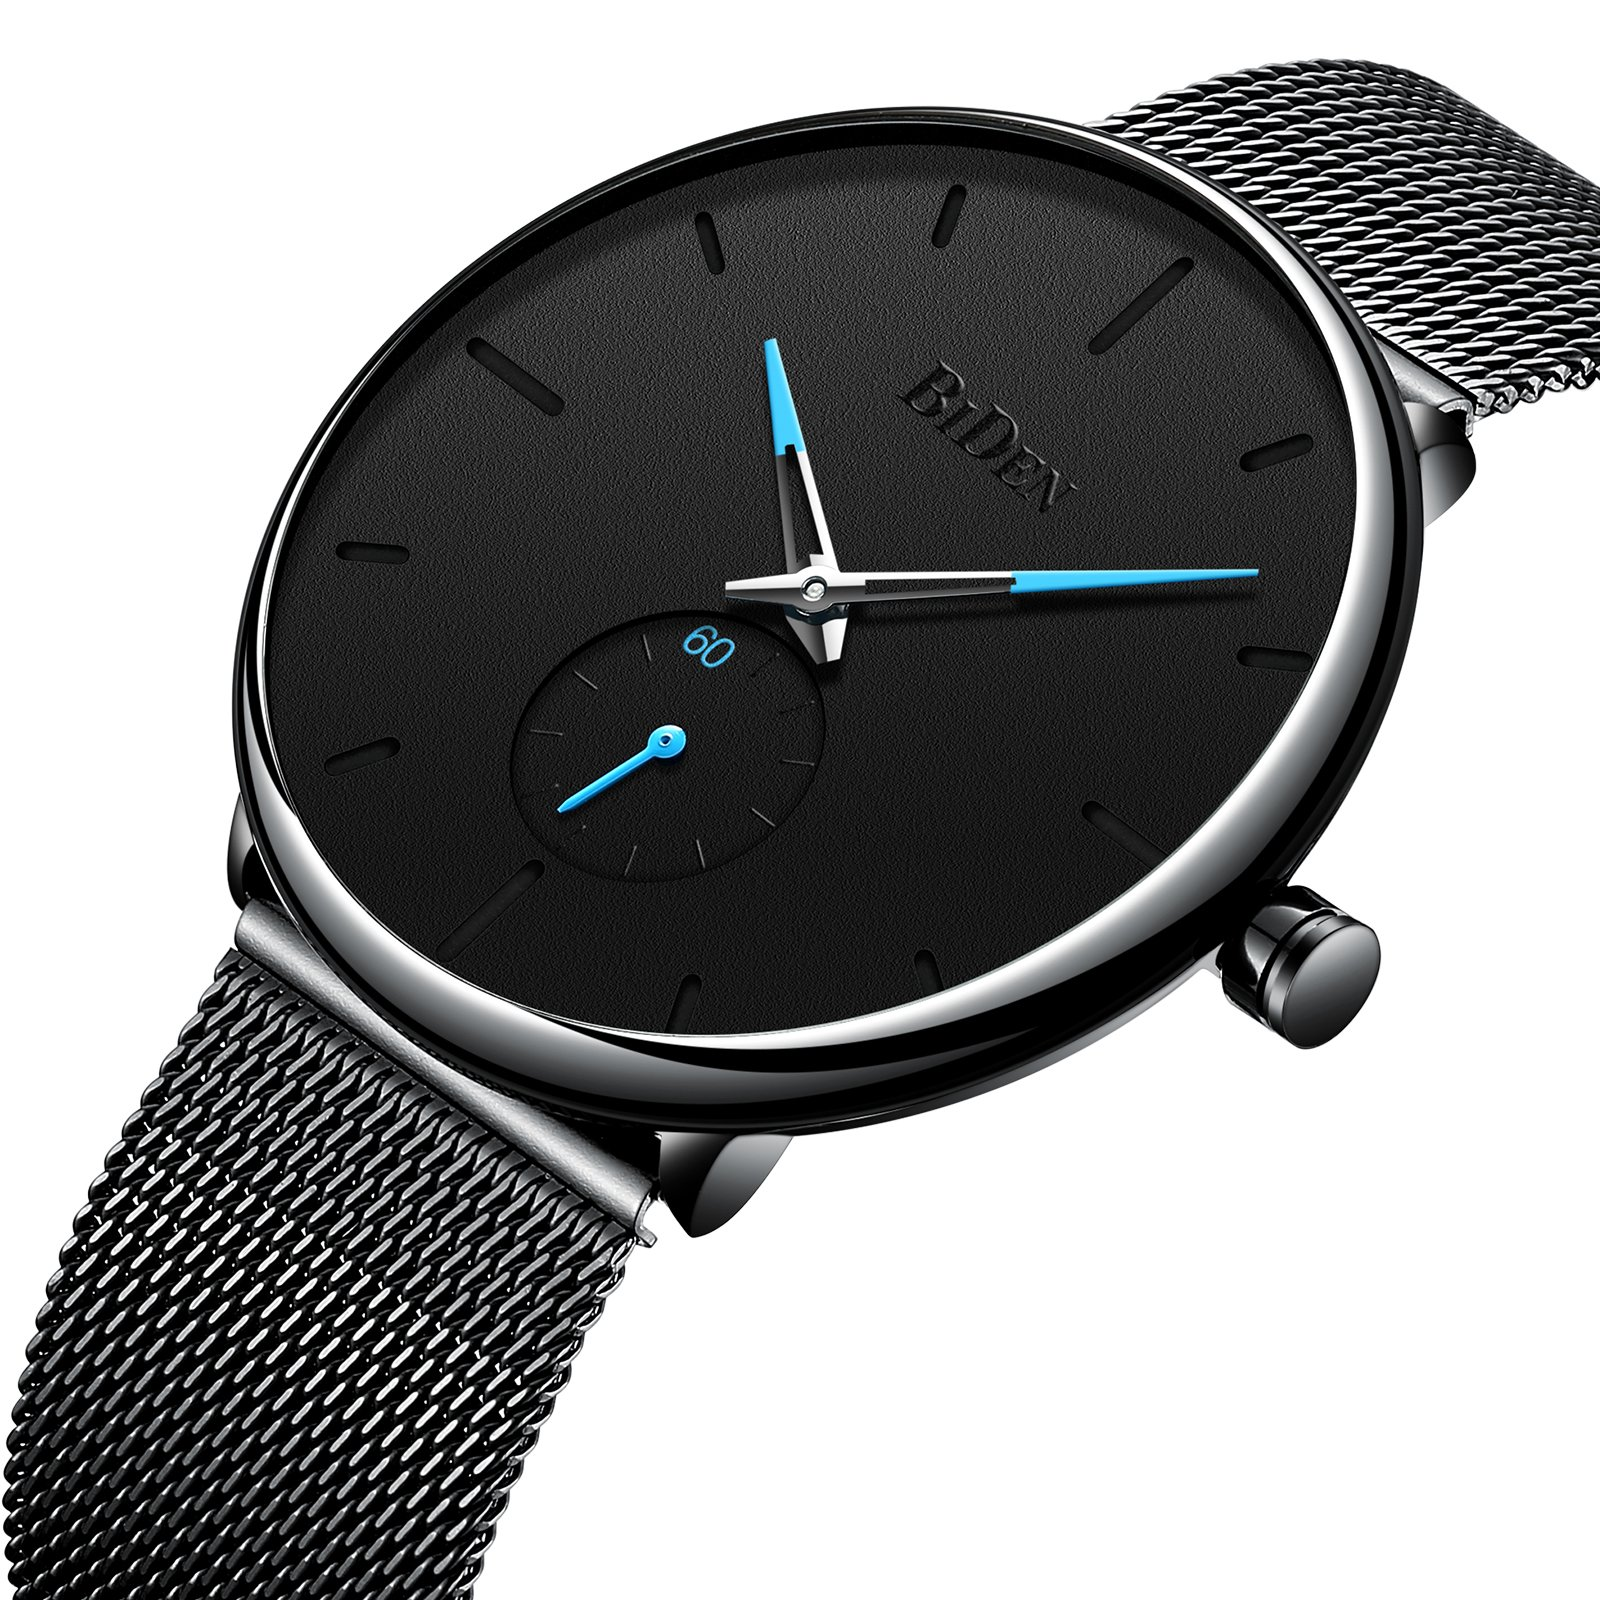 Men's Watch Unisex Minimalist Watch Waterproof Wrist Watches Classic Gifts Black Mesh Band